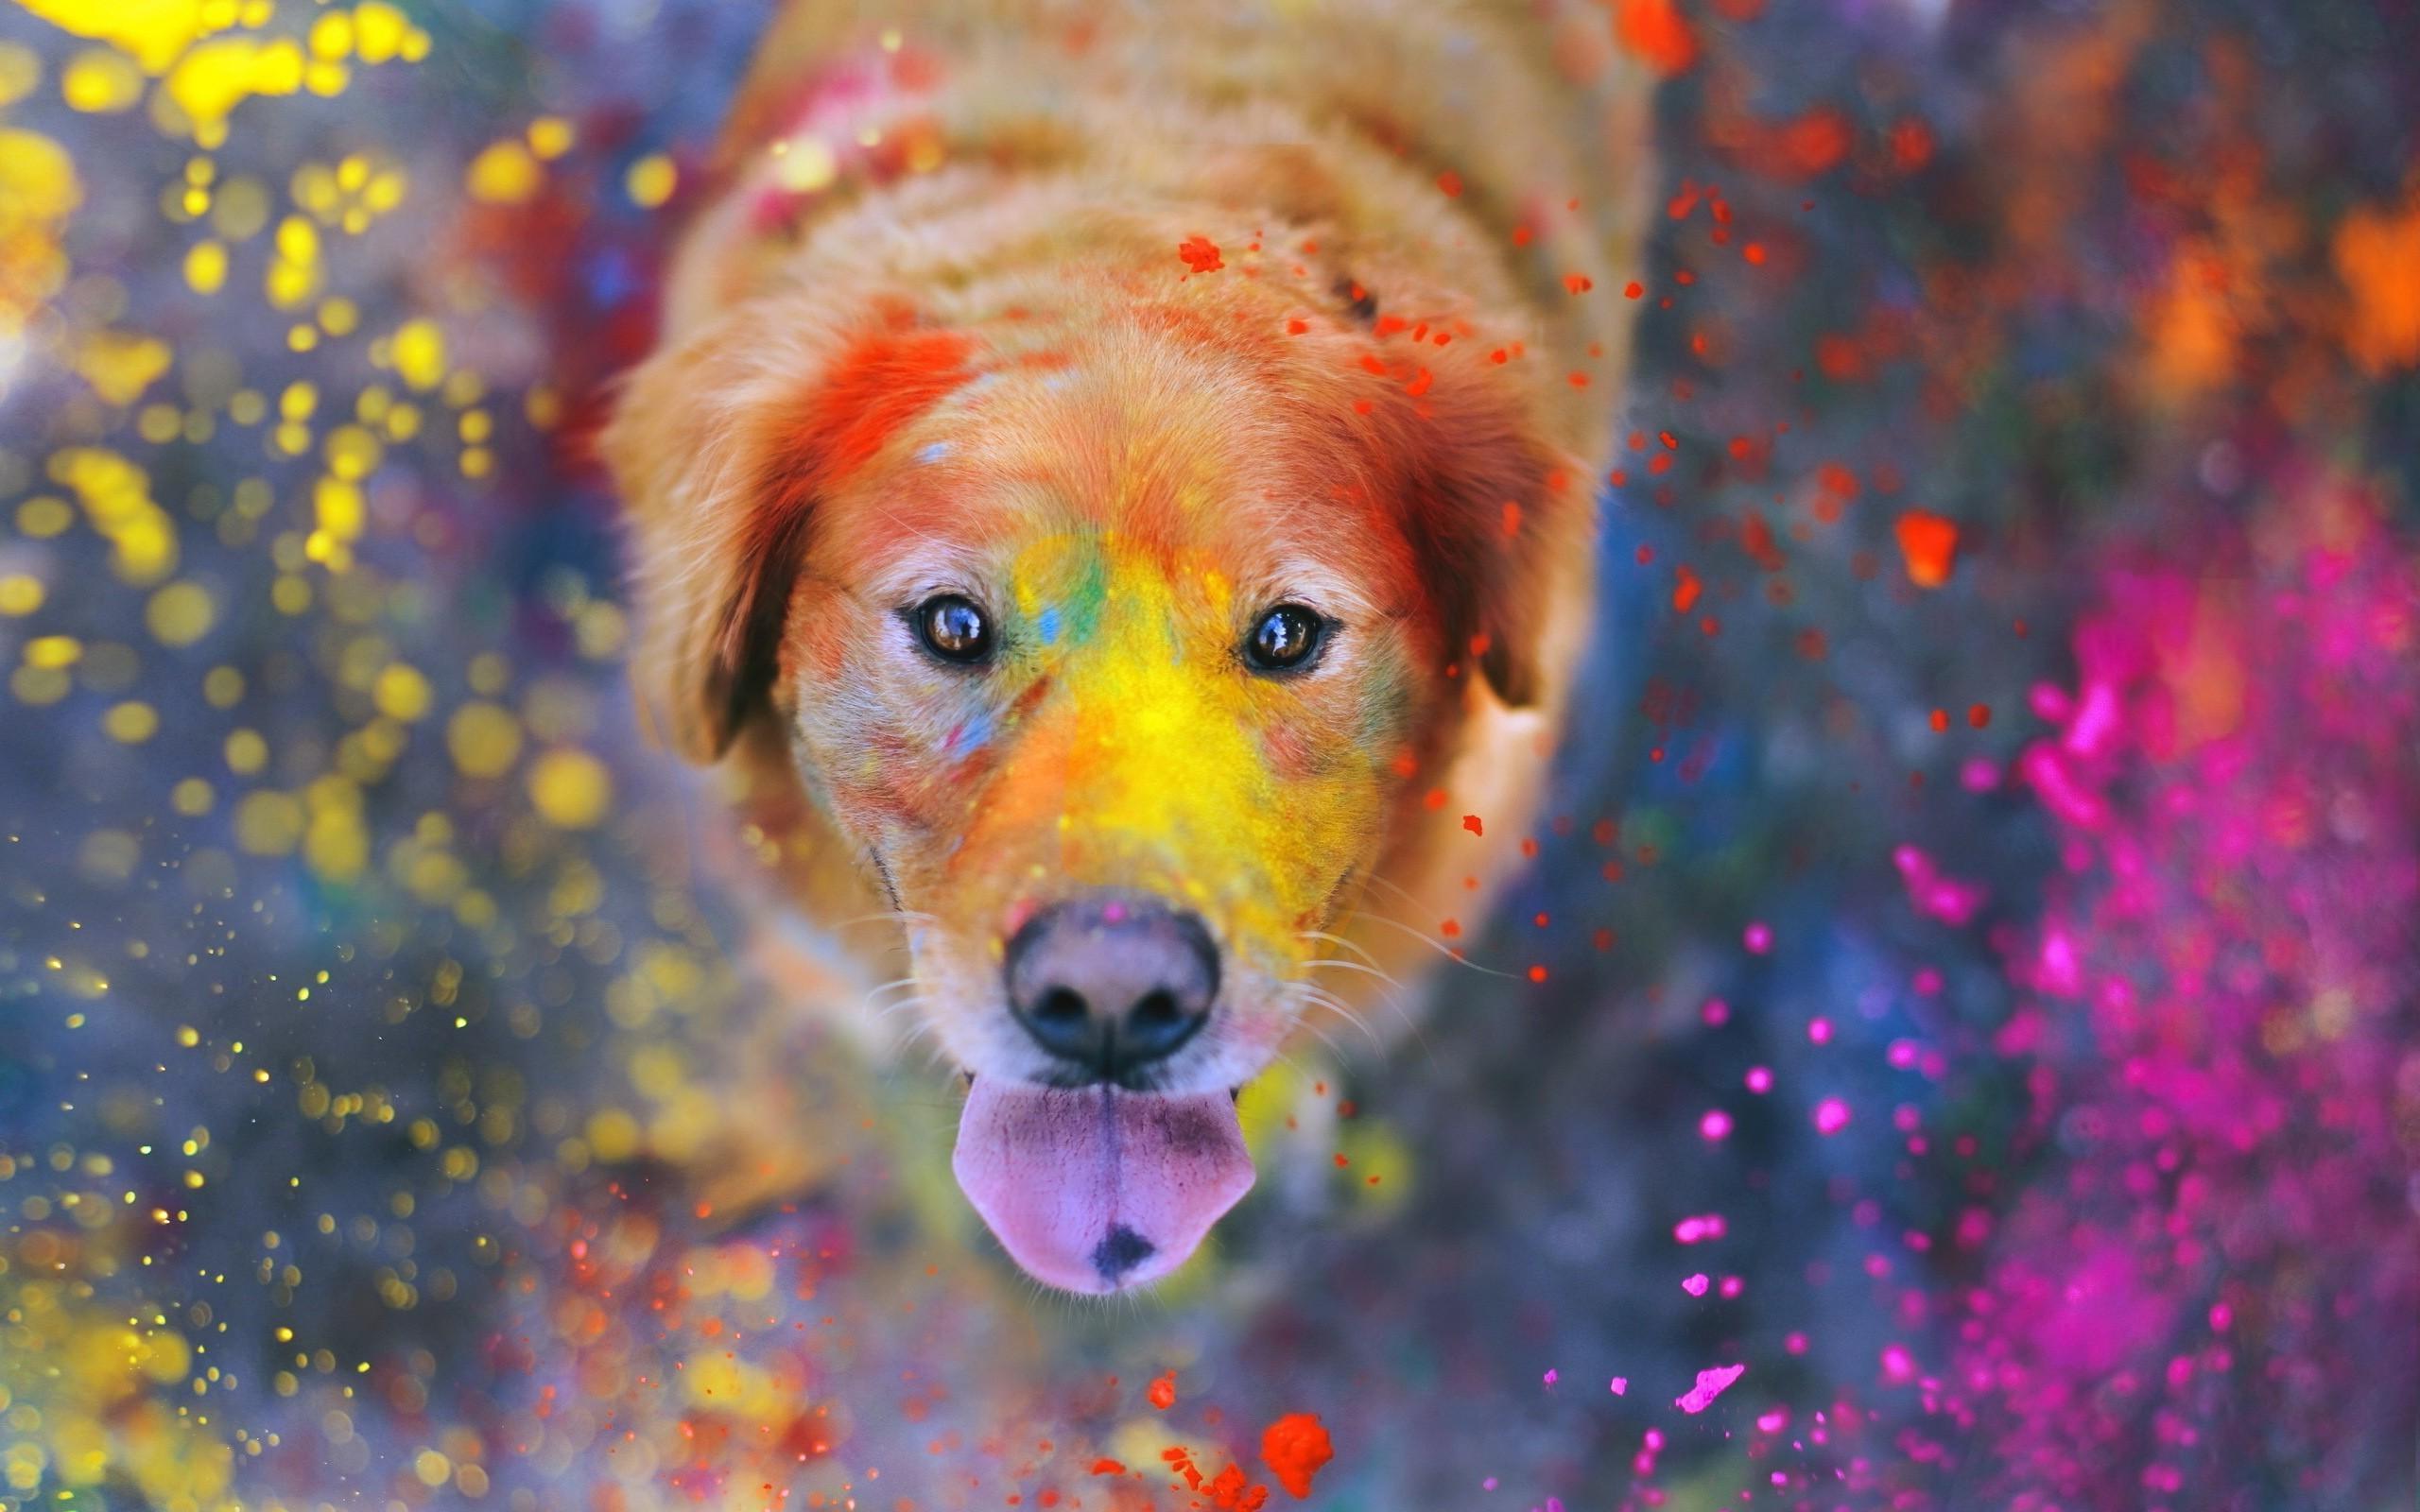 Animals Dog Filter Wallpapers Hd Desktop And Mobile: Paint Splatter Wallpaper (73+ Images